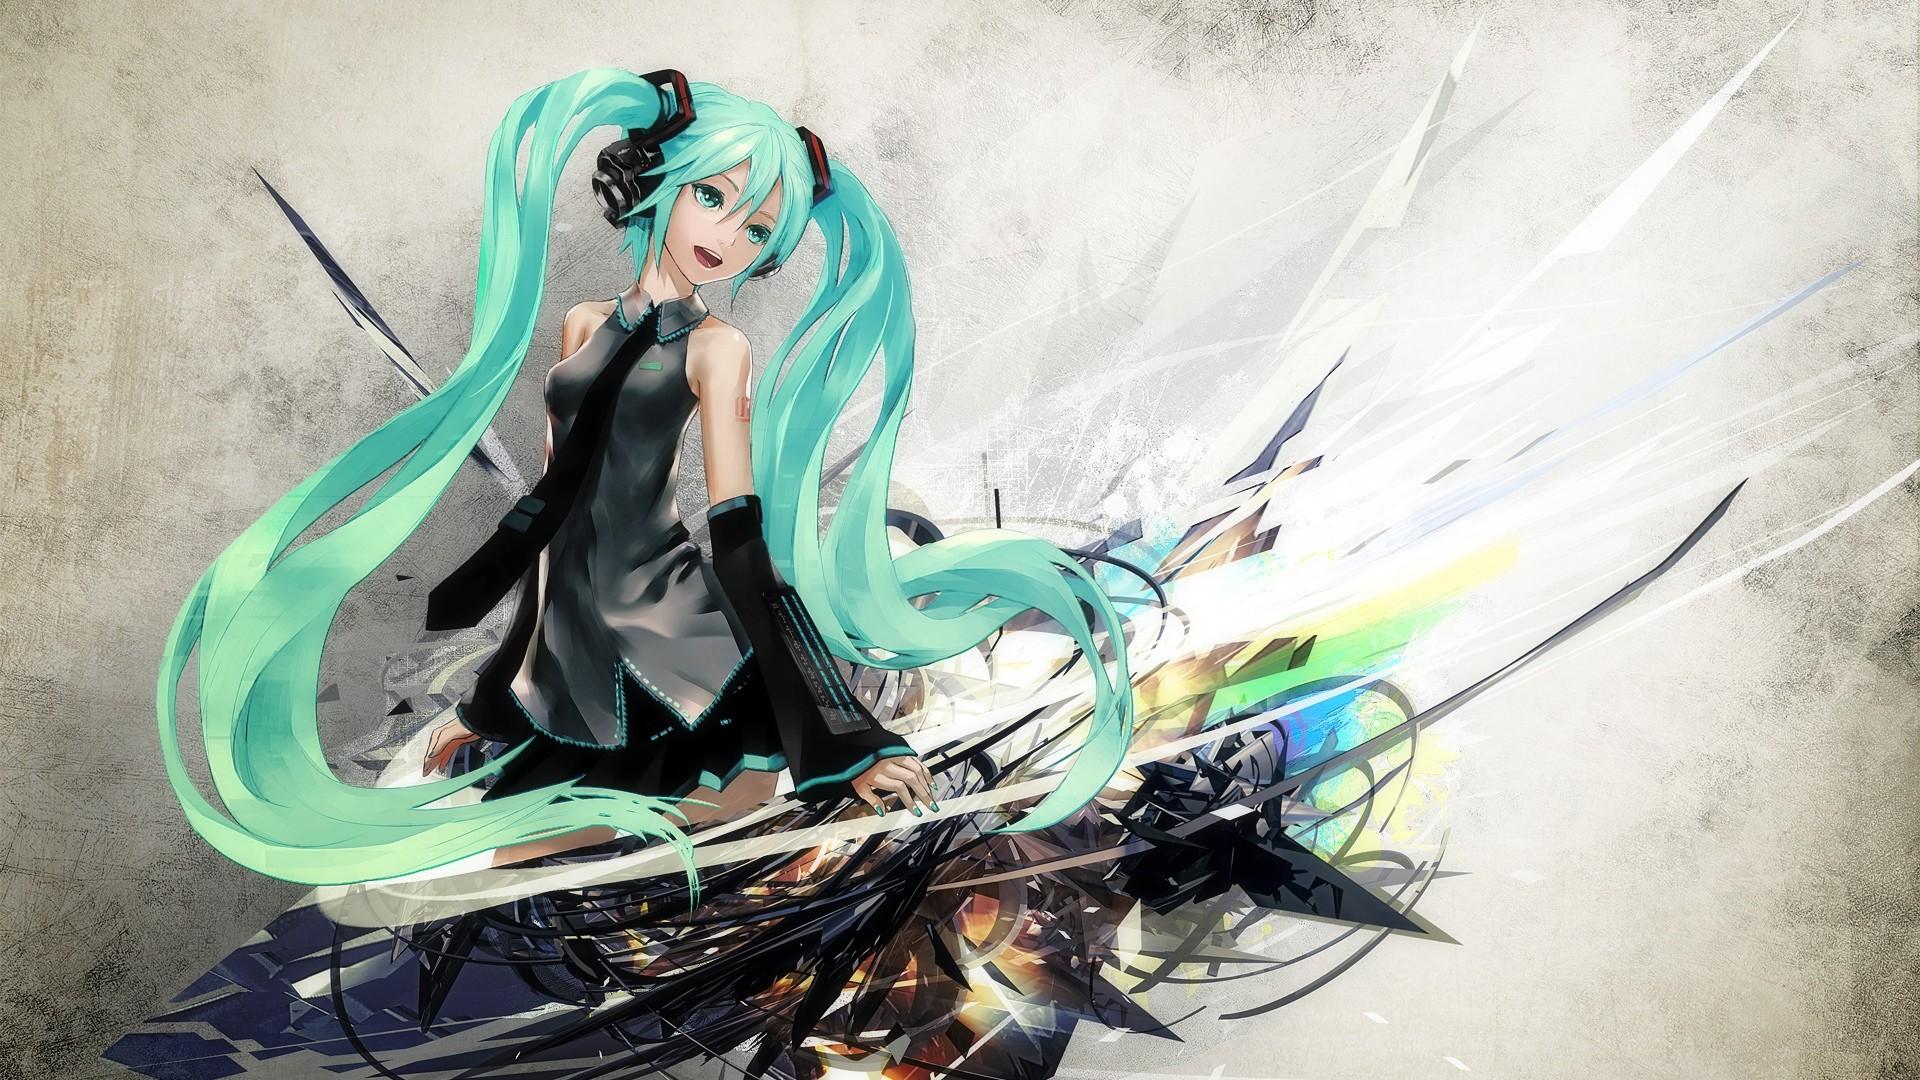 Themes Gallery 1280×800 px · VPK.866 Anime Girl Wallpapers, Karen Balch